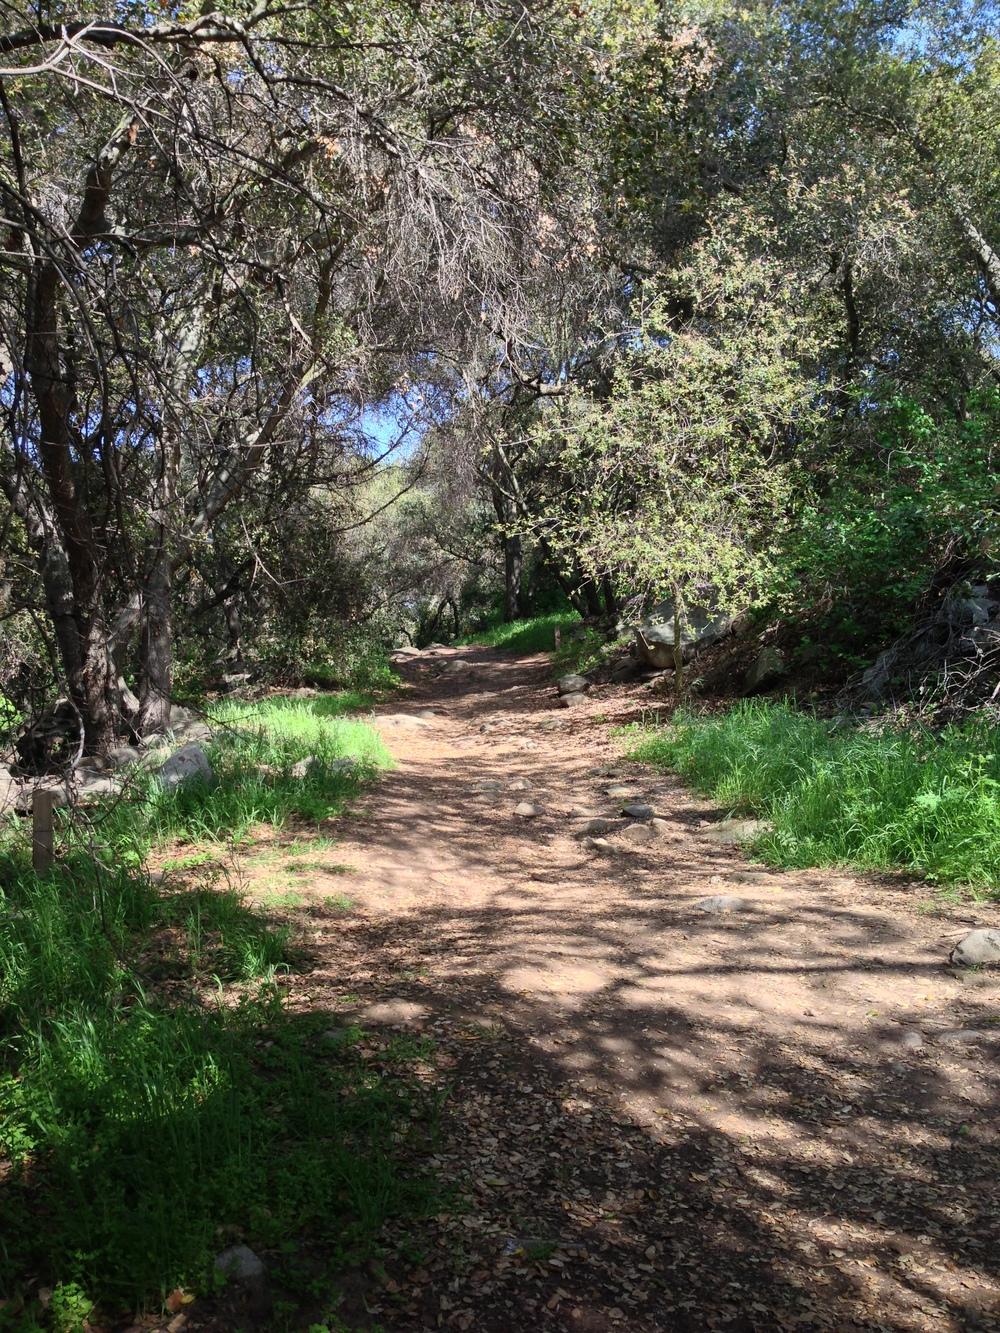 Passing through the Coastal Oak Grove, Elfin Forest